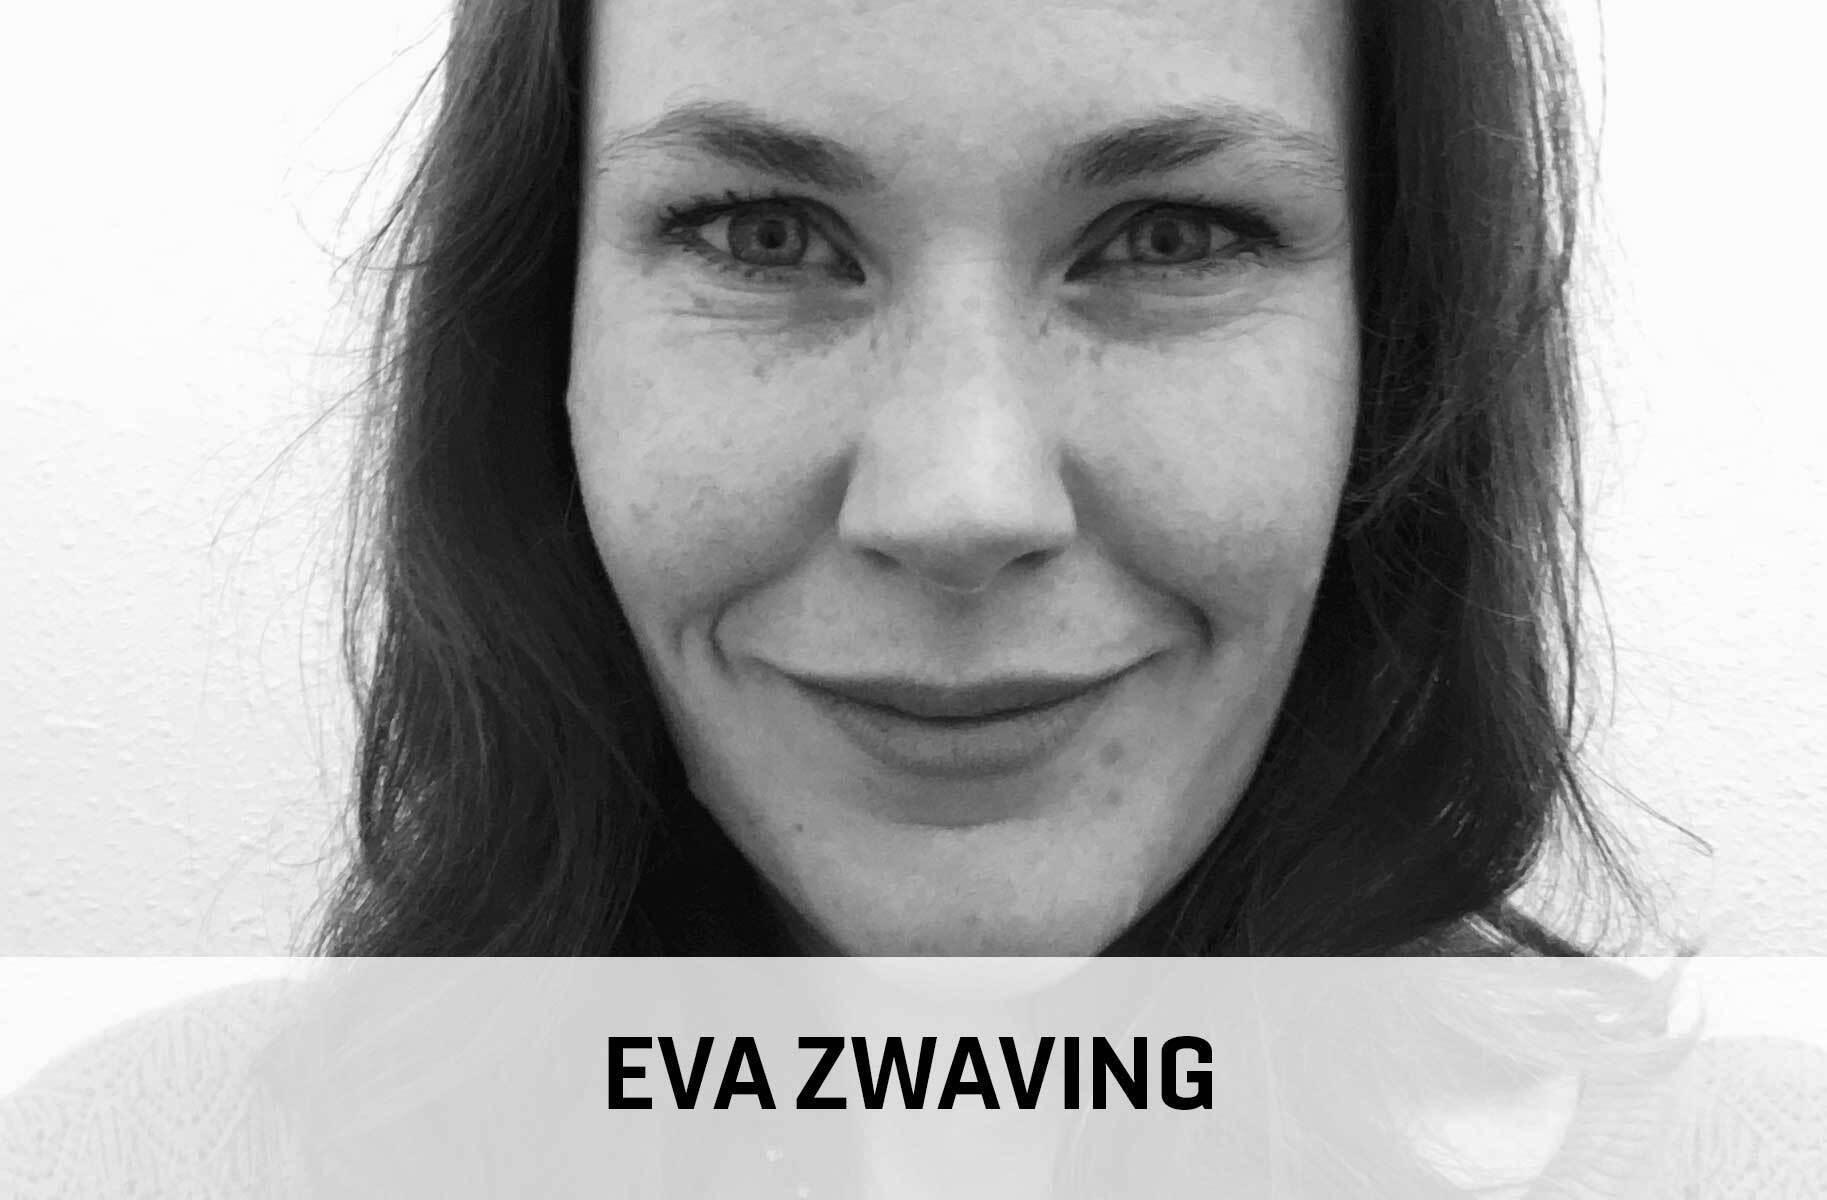 Evazwaving